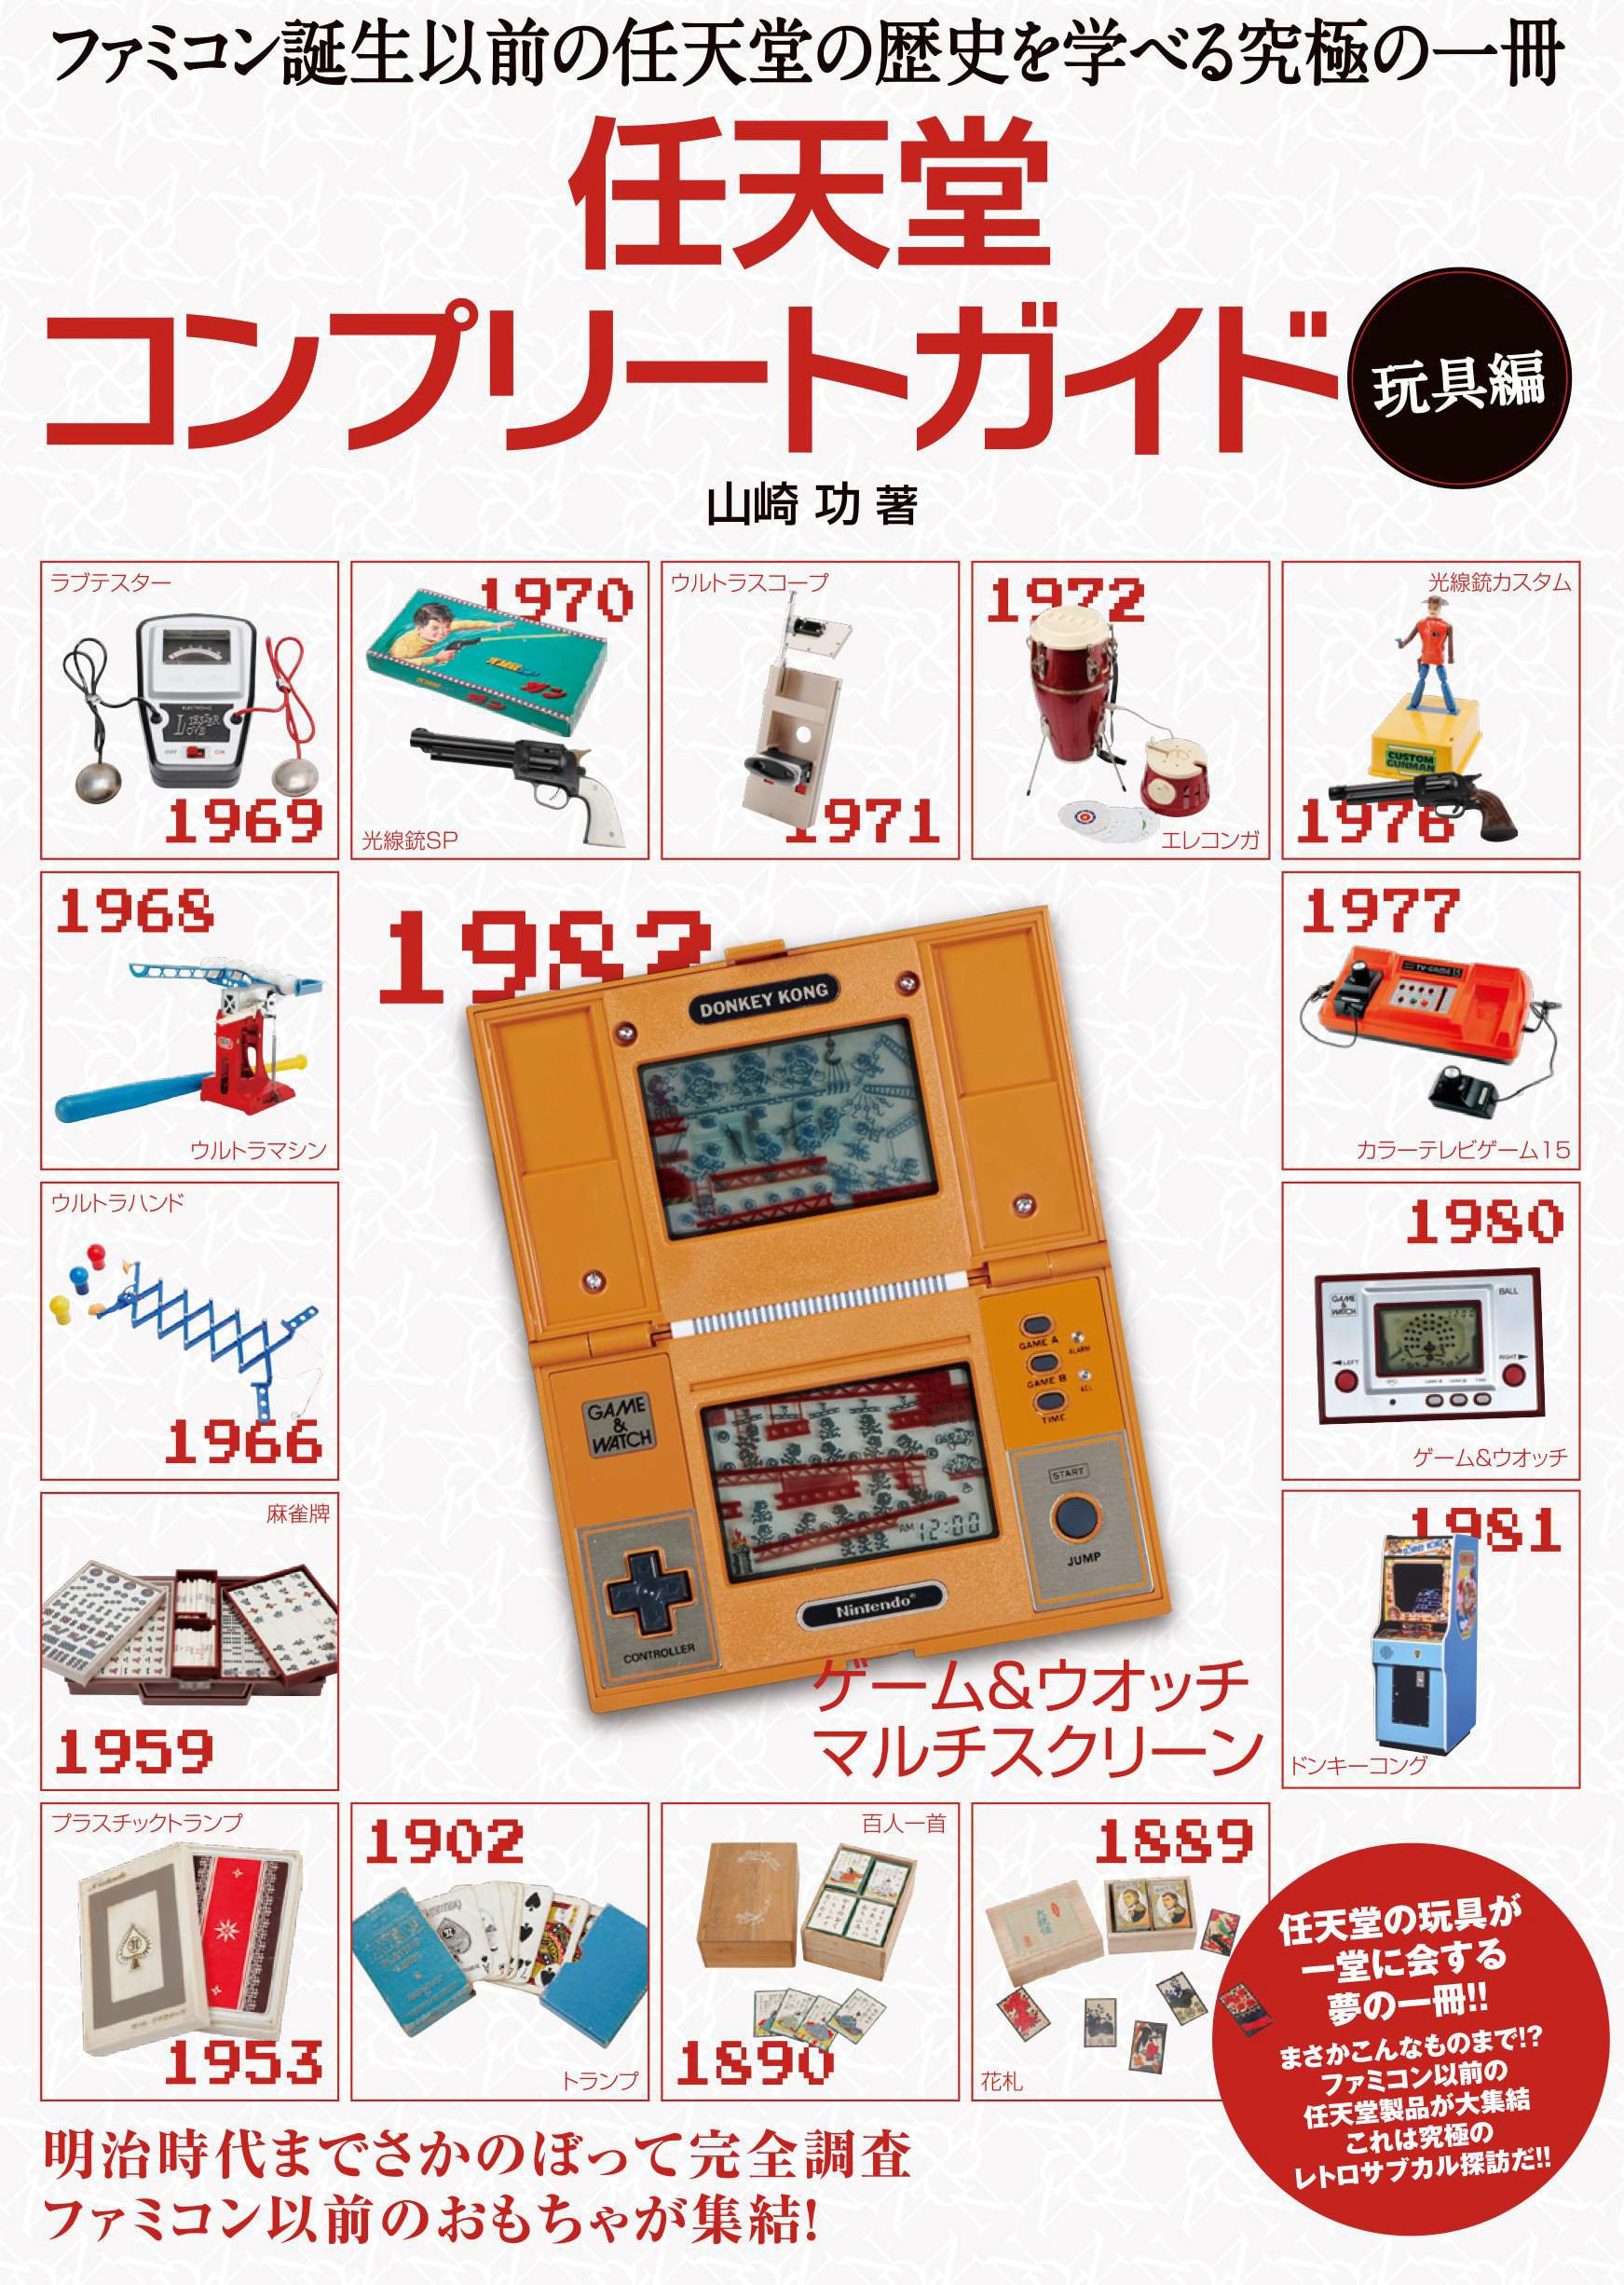 history of nintendo book pdf